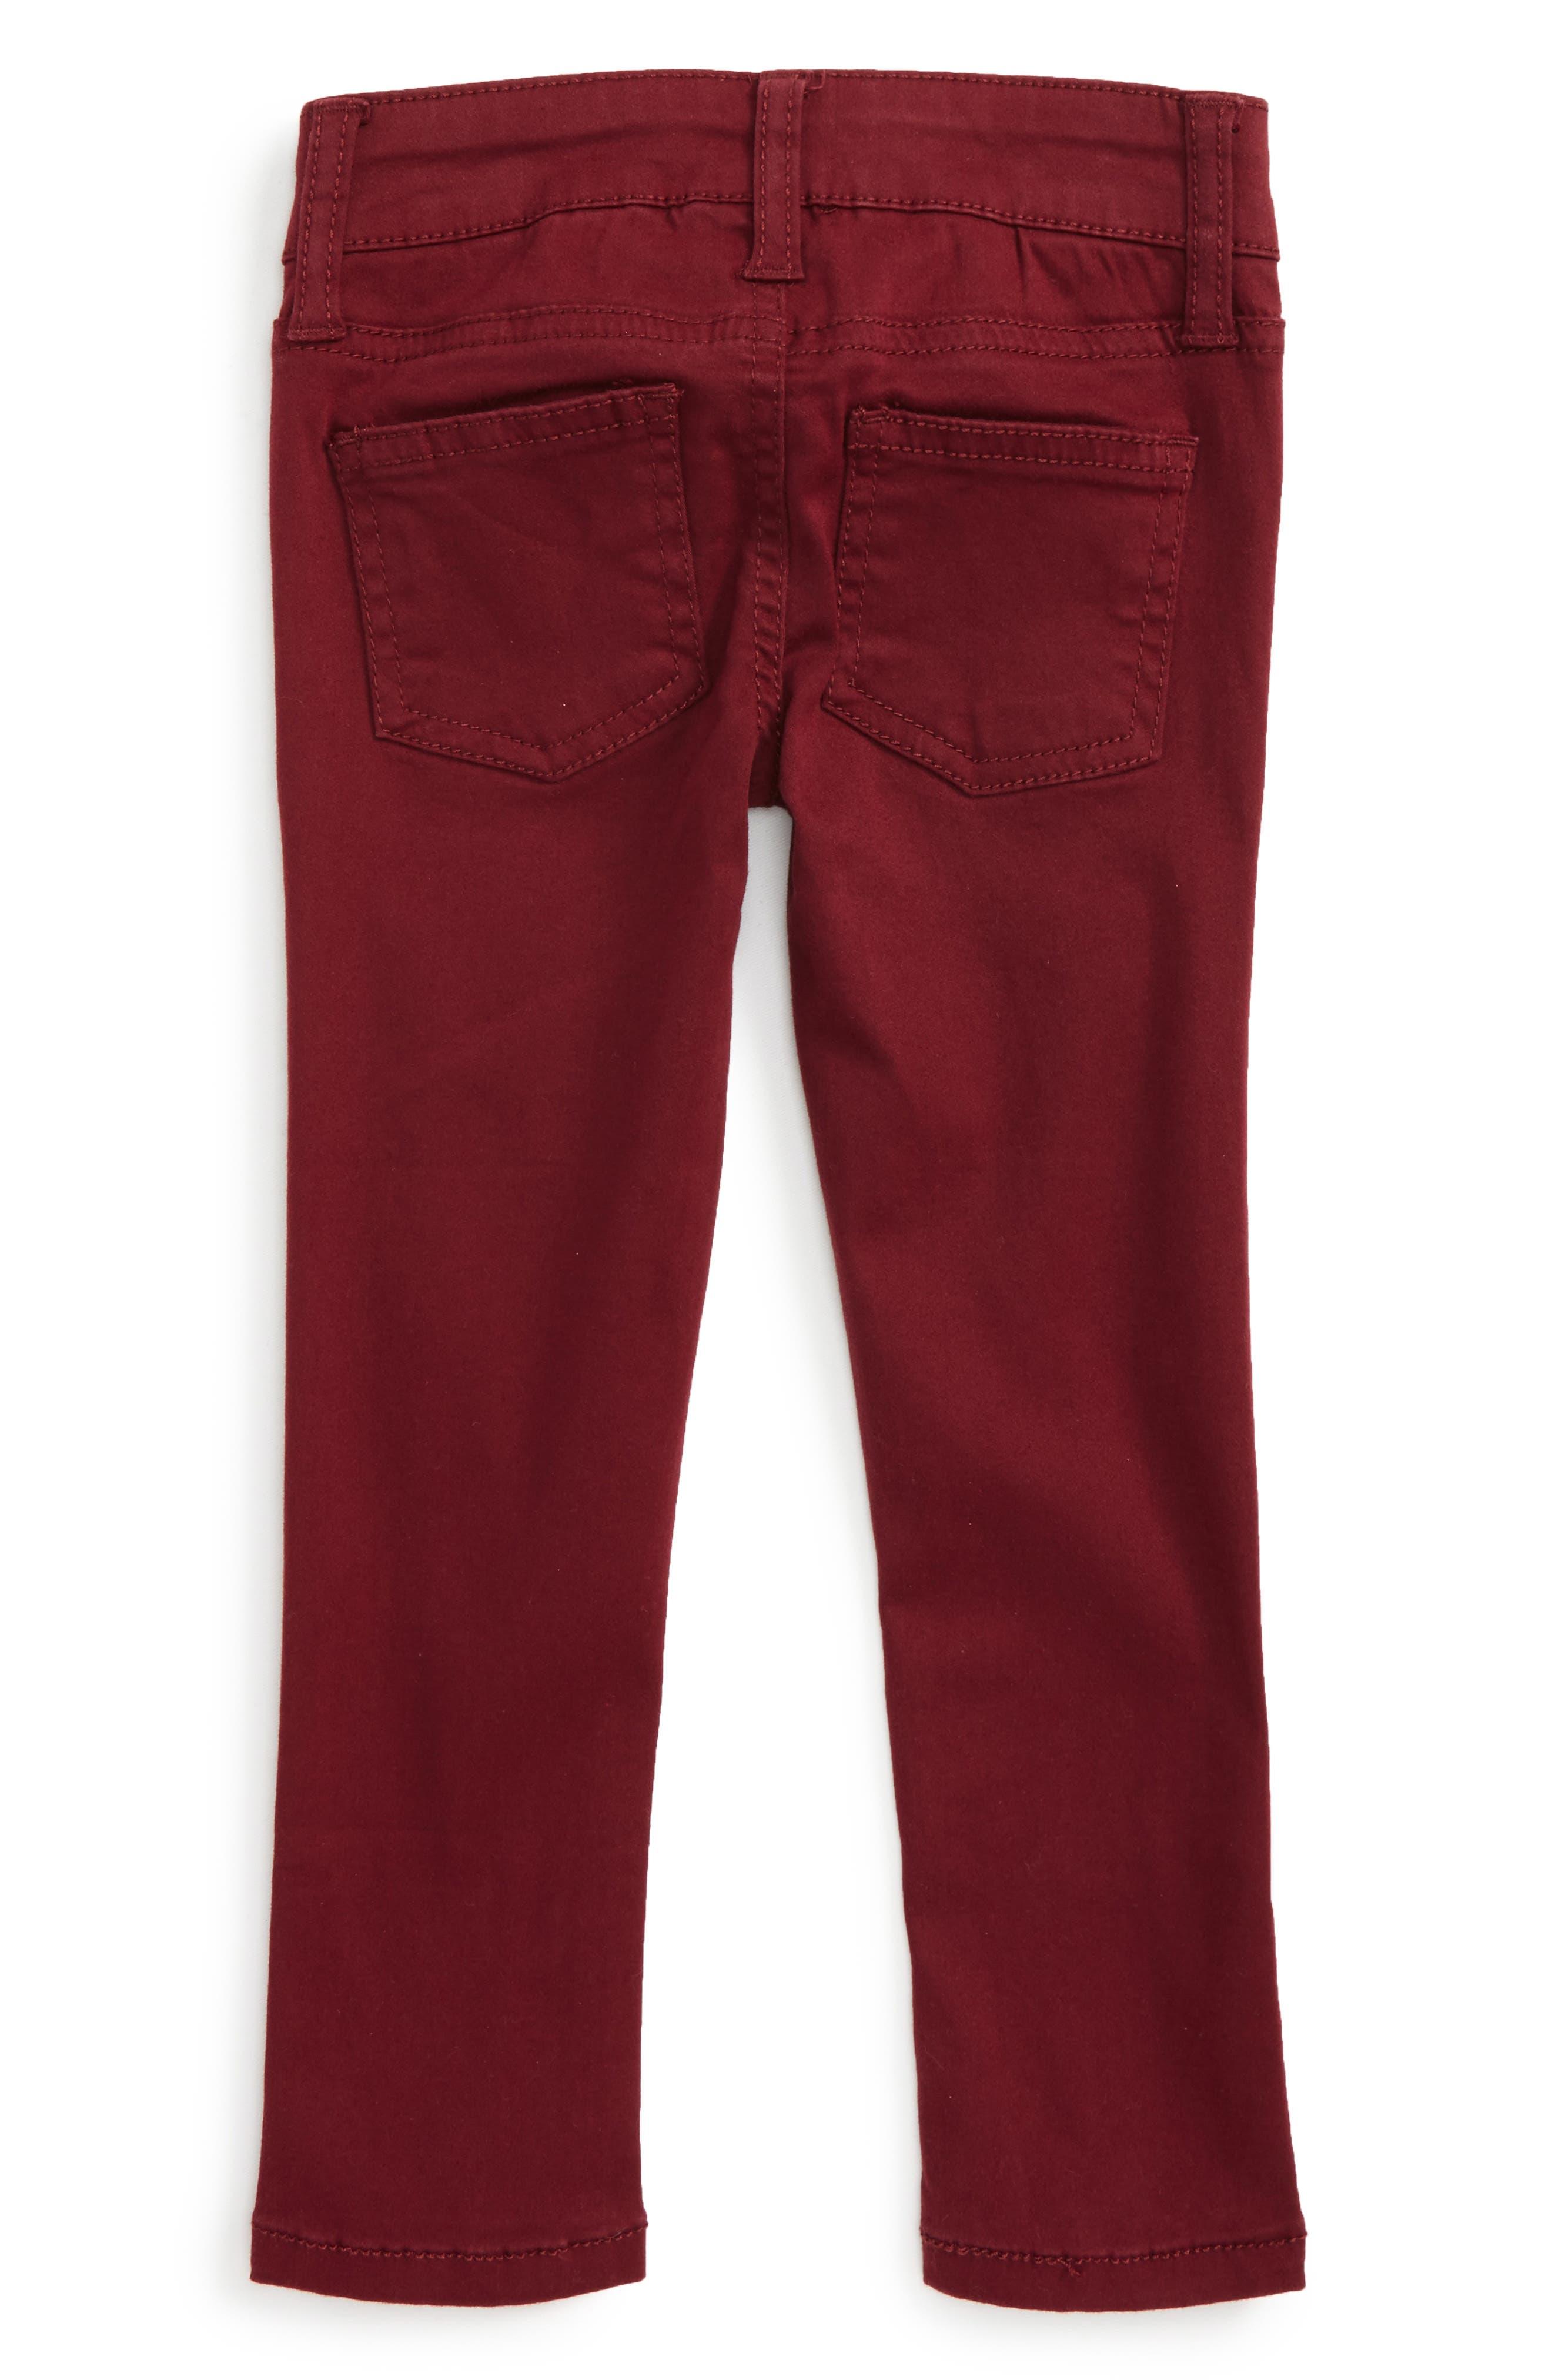 Alternate Image 2  - Peek Taylor Skinny Jeans (Toddler Girls, Little Girls & Big Girls)